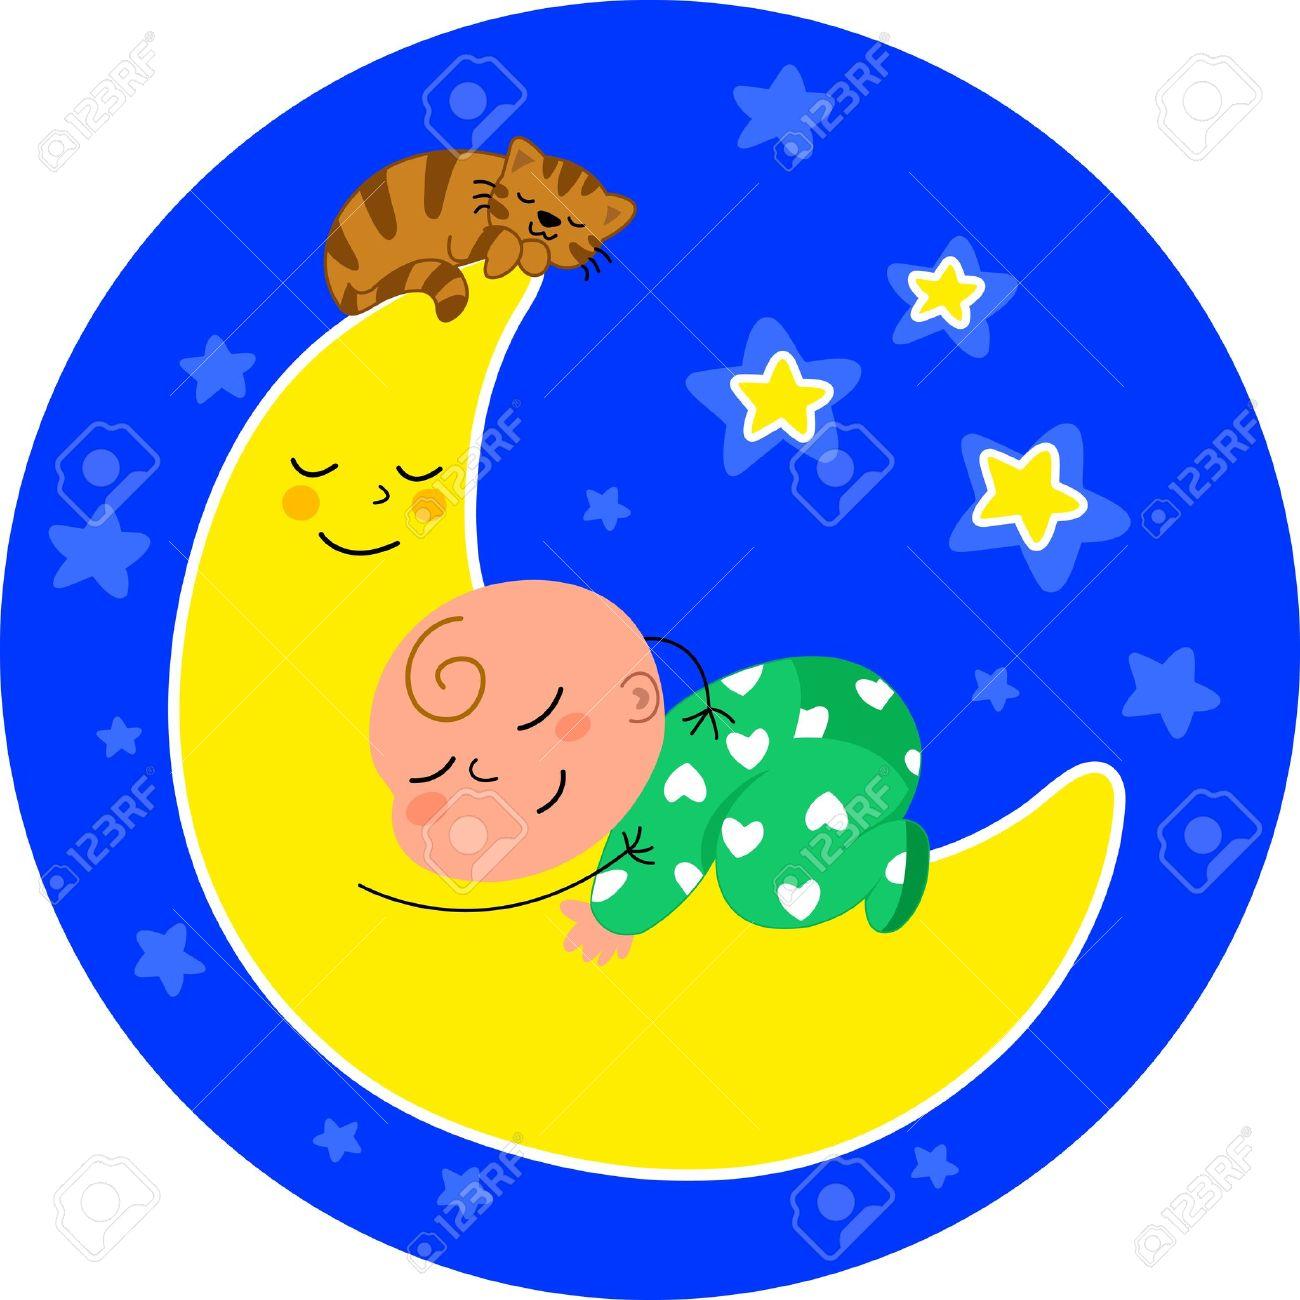 cute baby sleeping on the moon with little cat  Cartoon illustration Stock Vector - 13585377